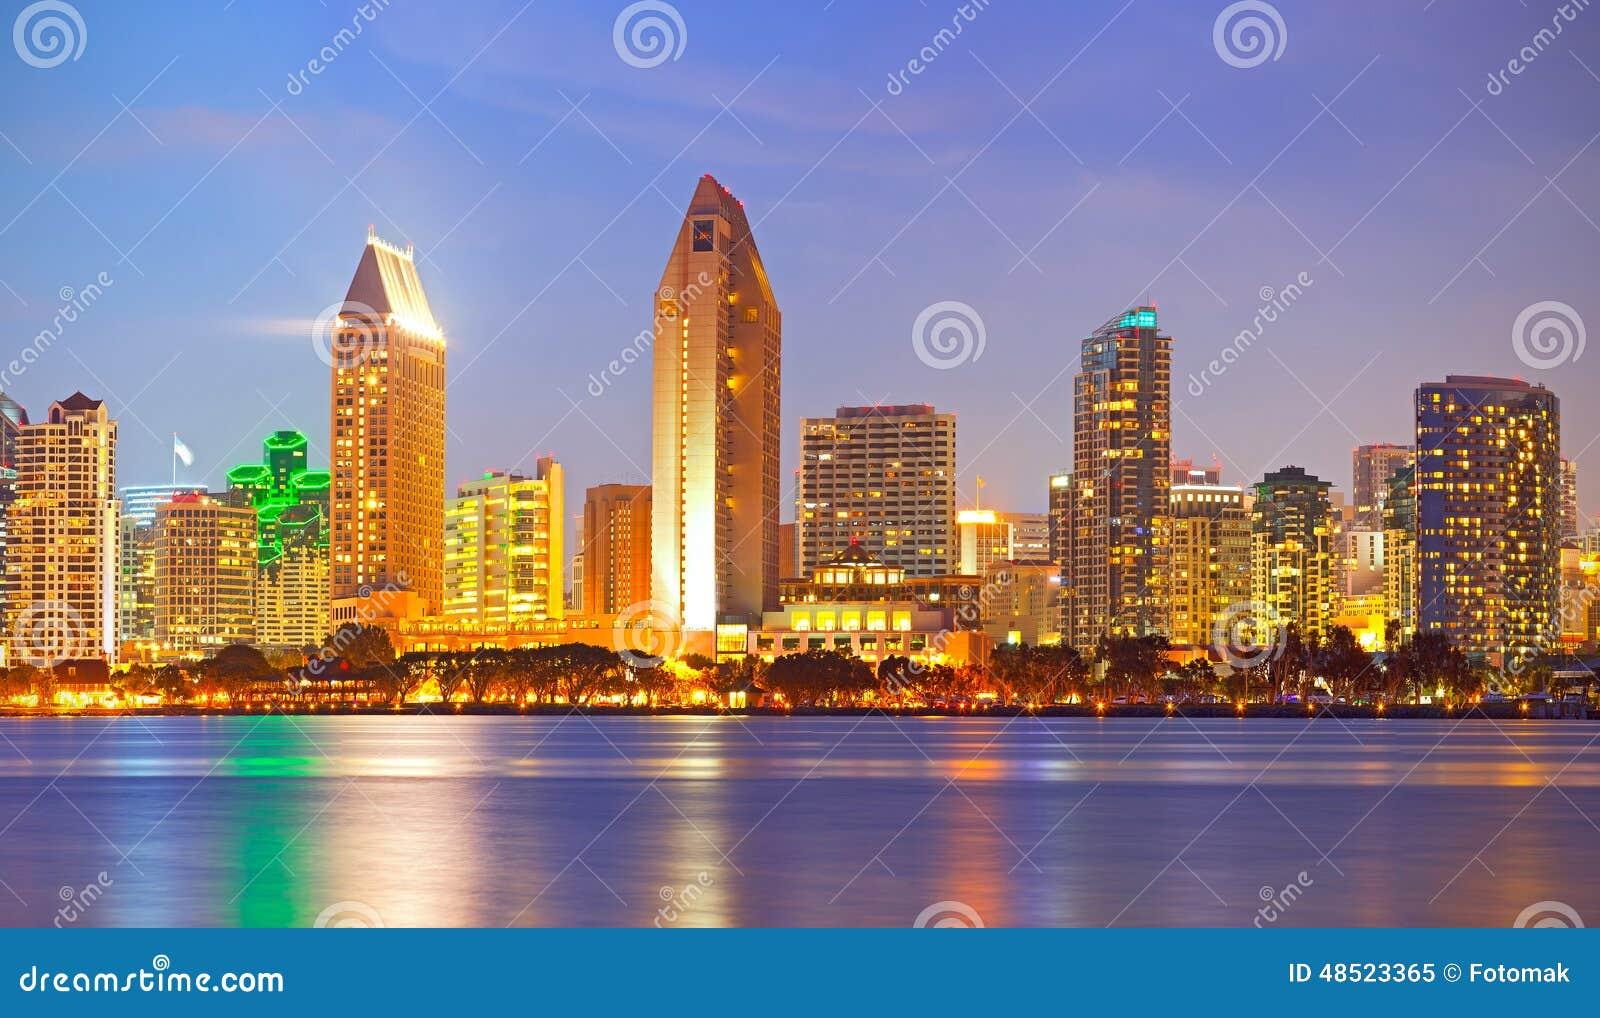 city of san diego california stock image image of banks illuminated 48523365. Black Bedroom Furniture Sets. Home Design Ideas